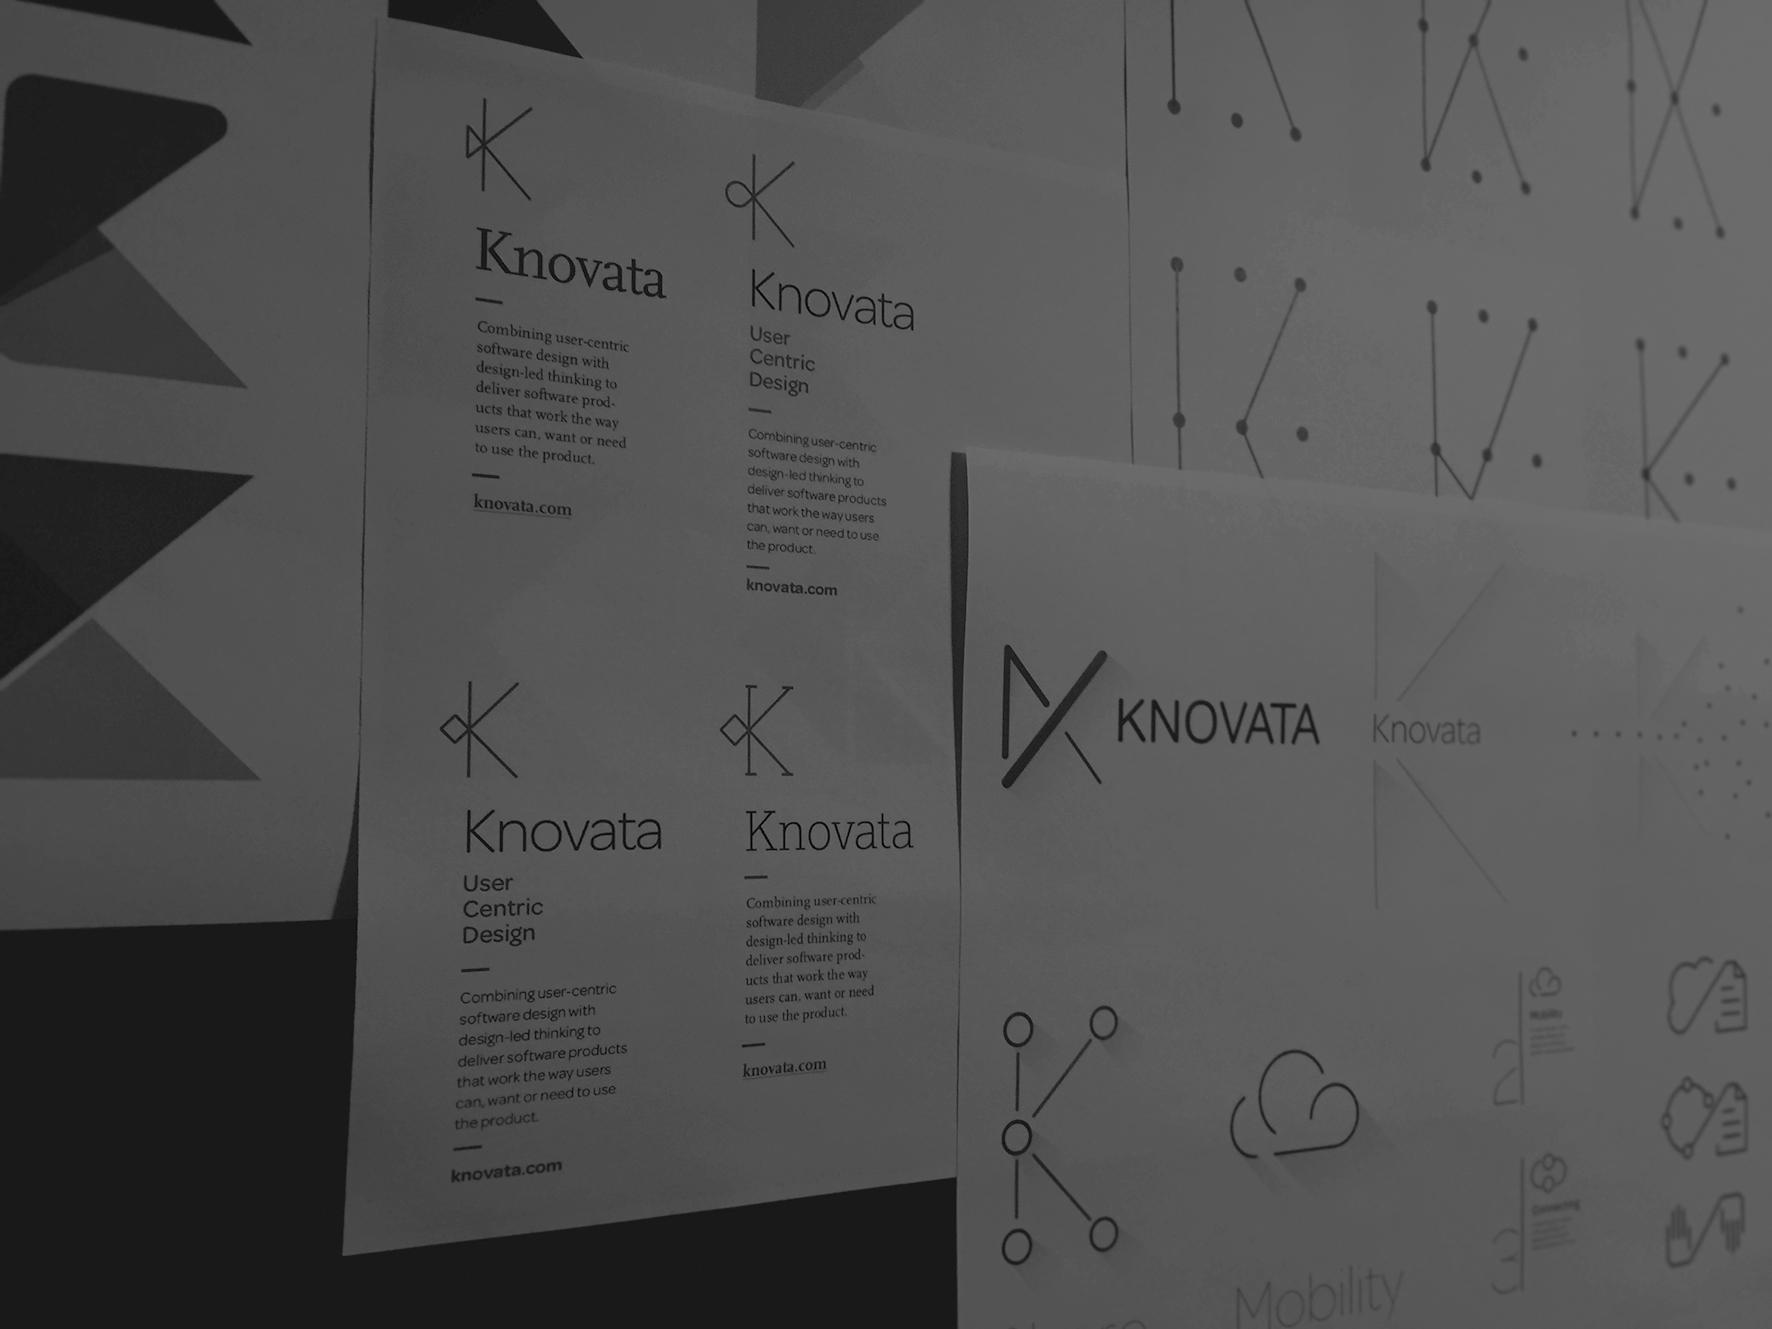 FBD_Knovata_Ref_6.jpg